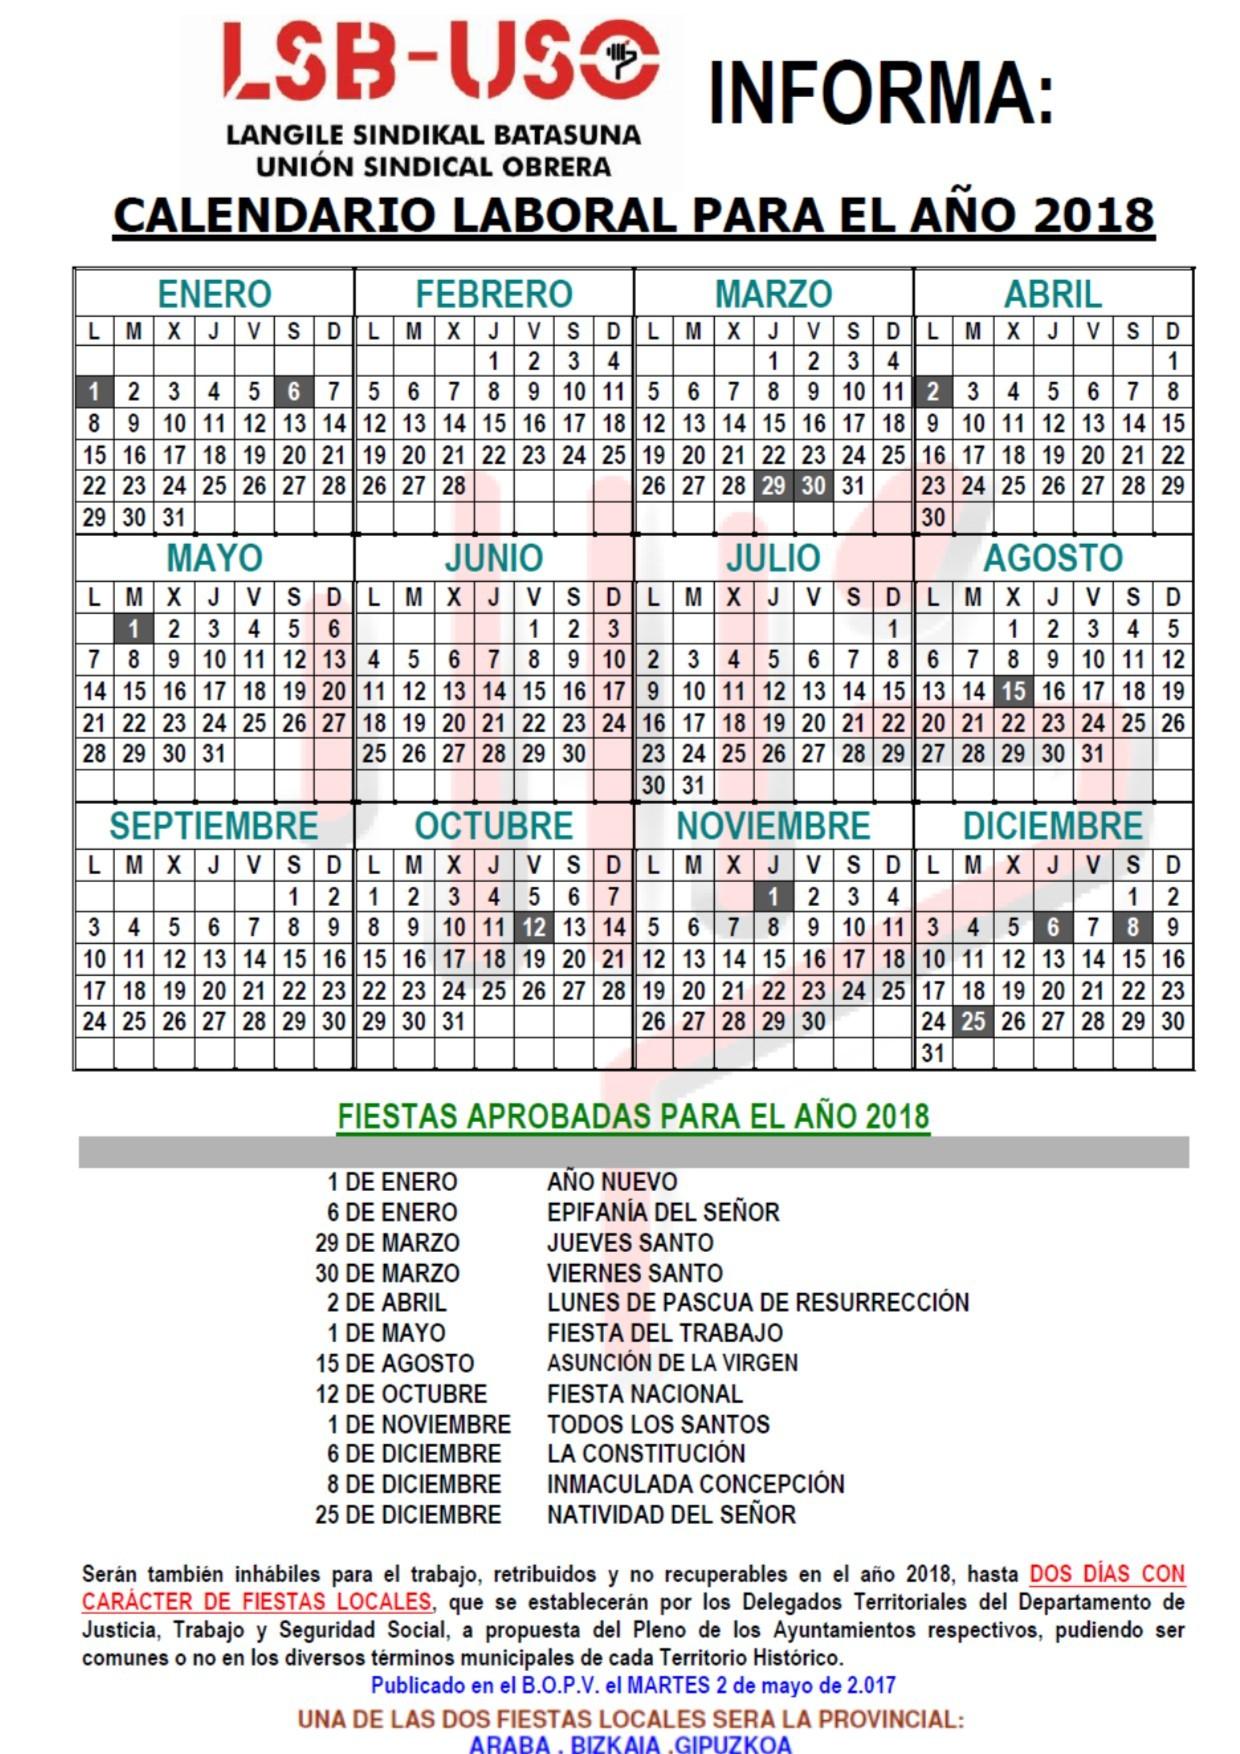 Calendario 2019 Festivos Bizkaia Más Populares Calendario Laboral Boe 2019 Seonegativo